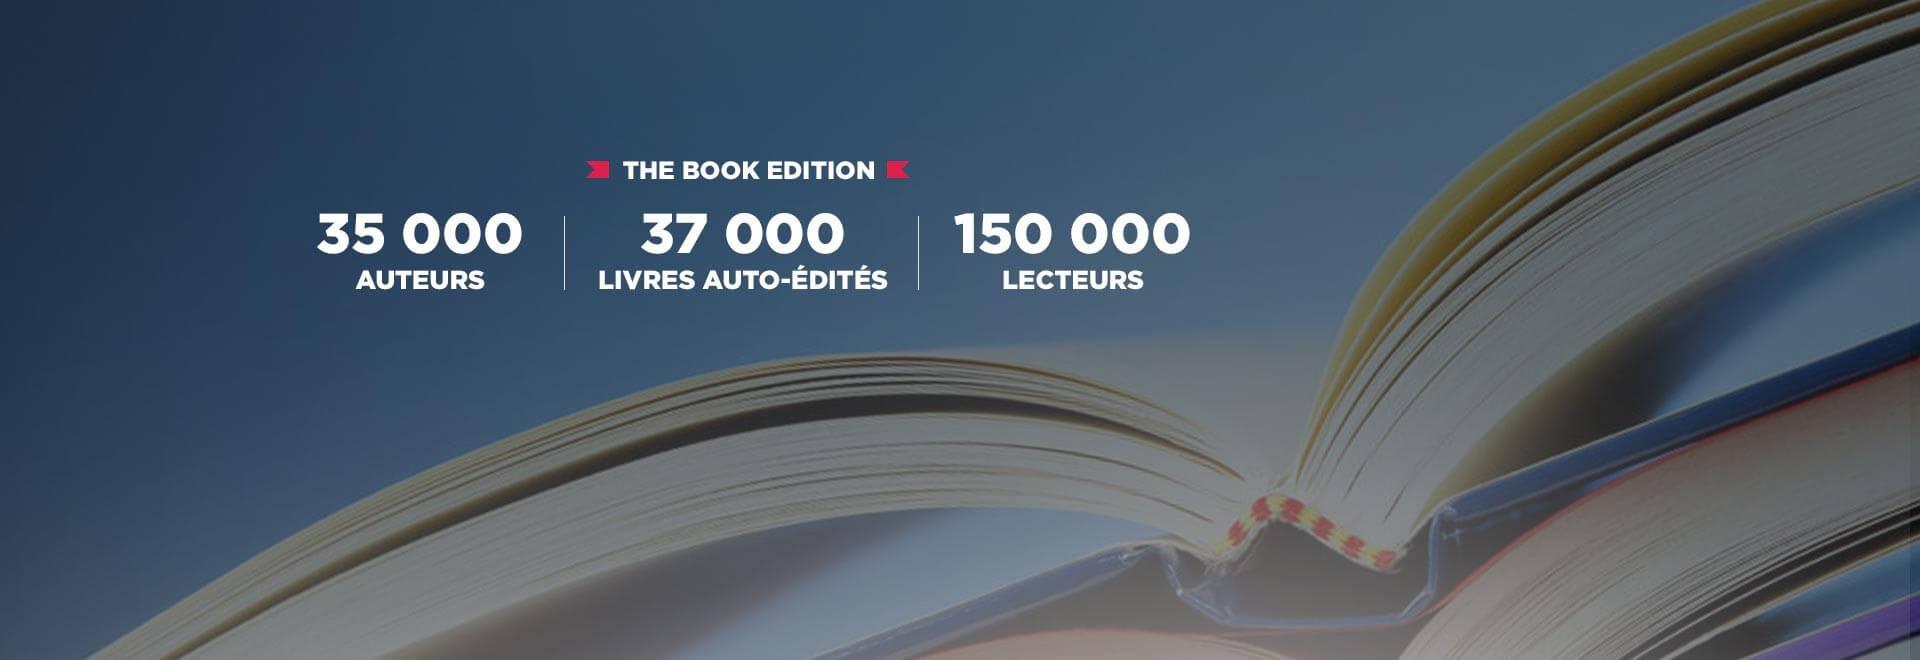 Creer un livre gratuitement avec TheBookEdition